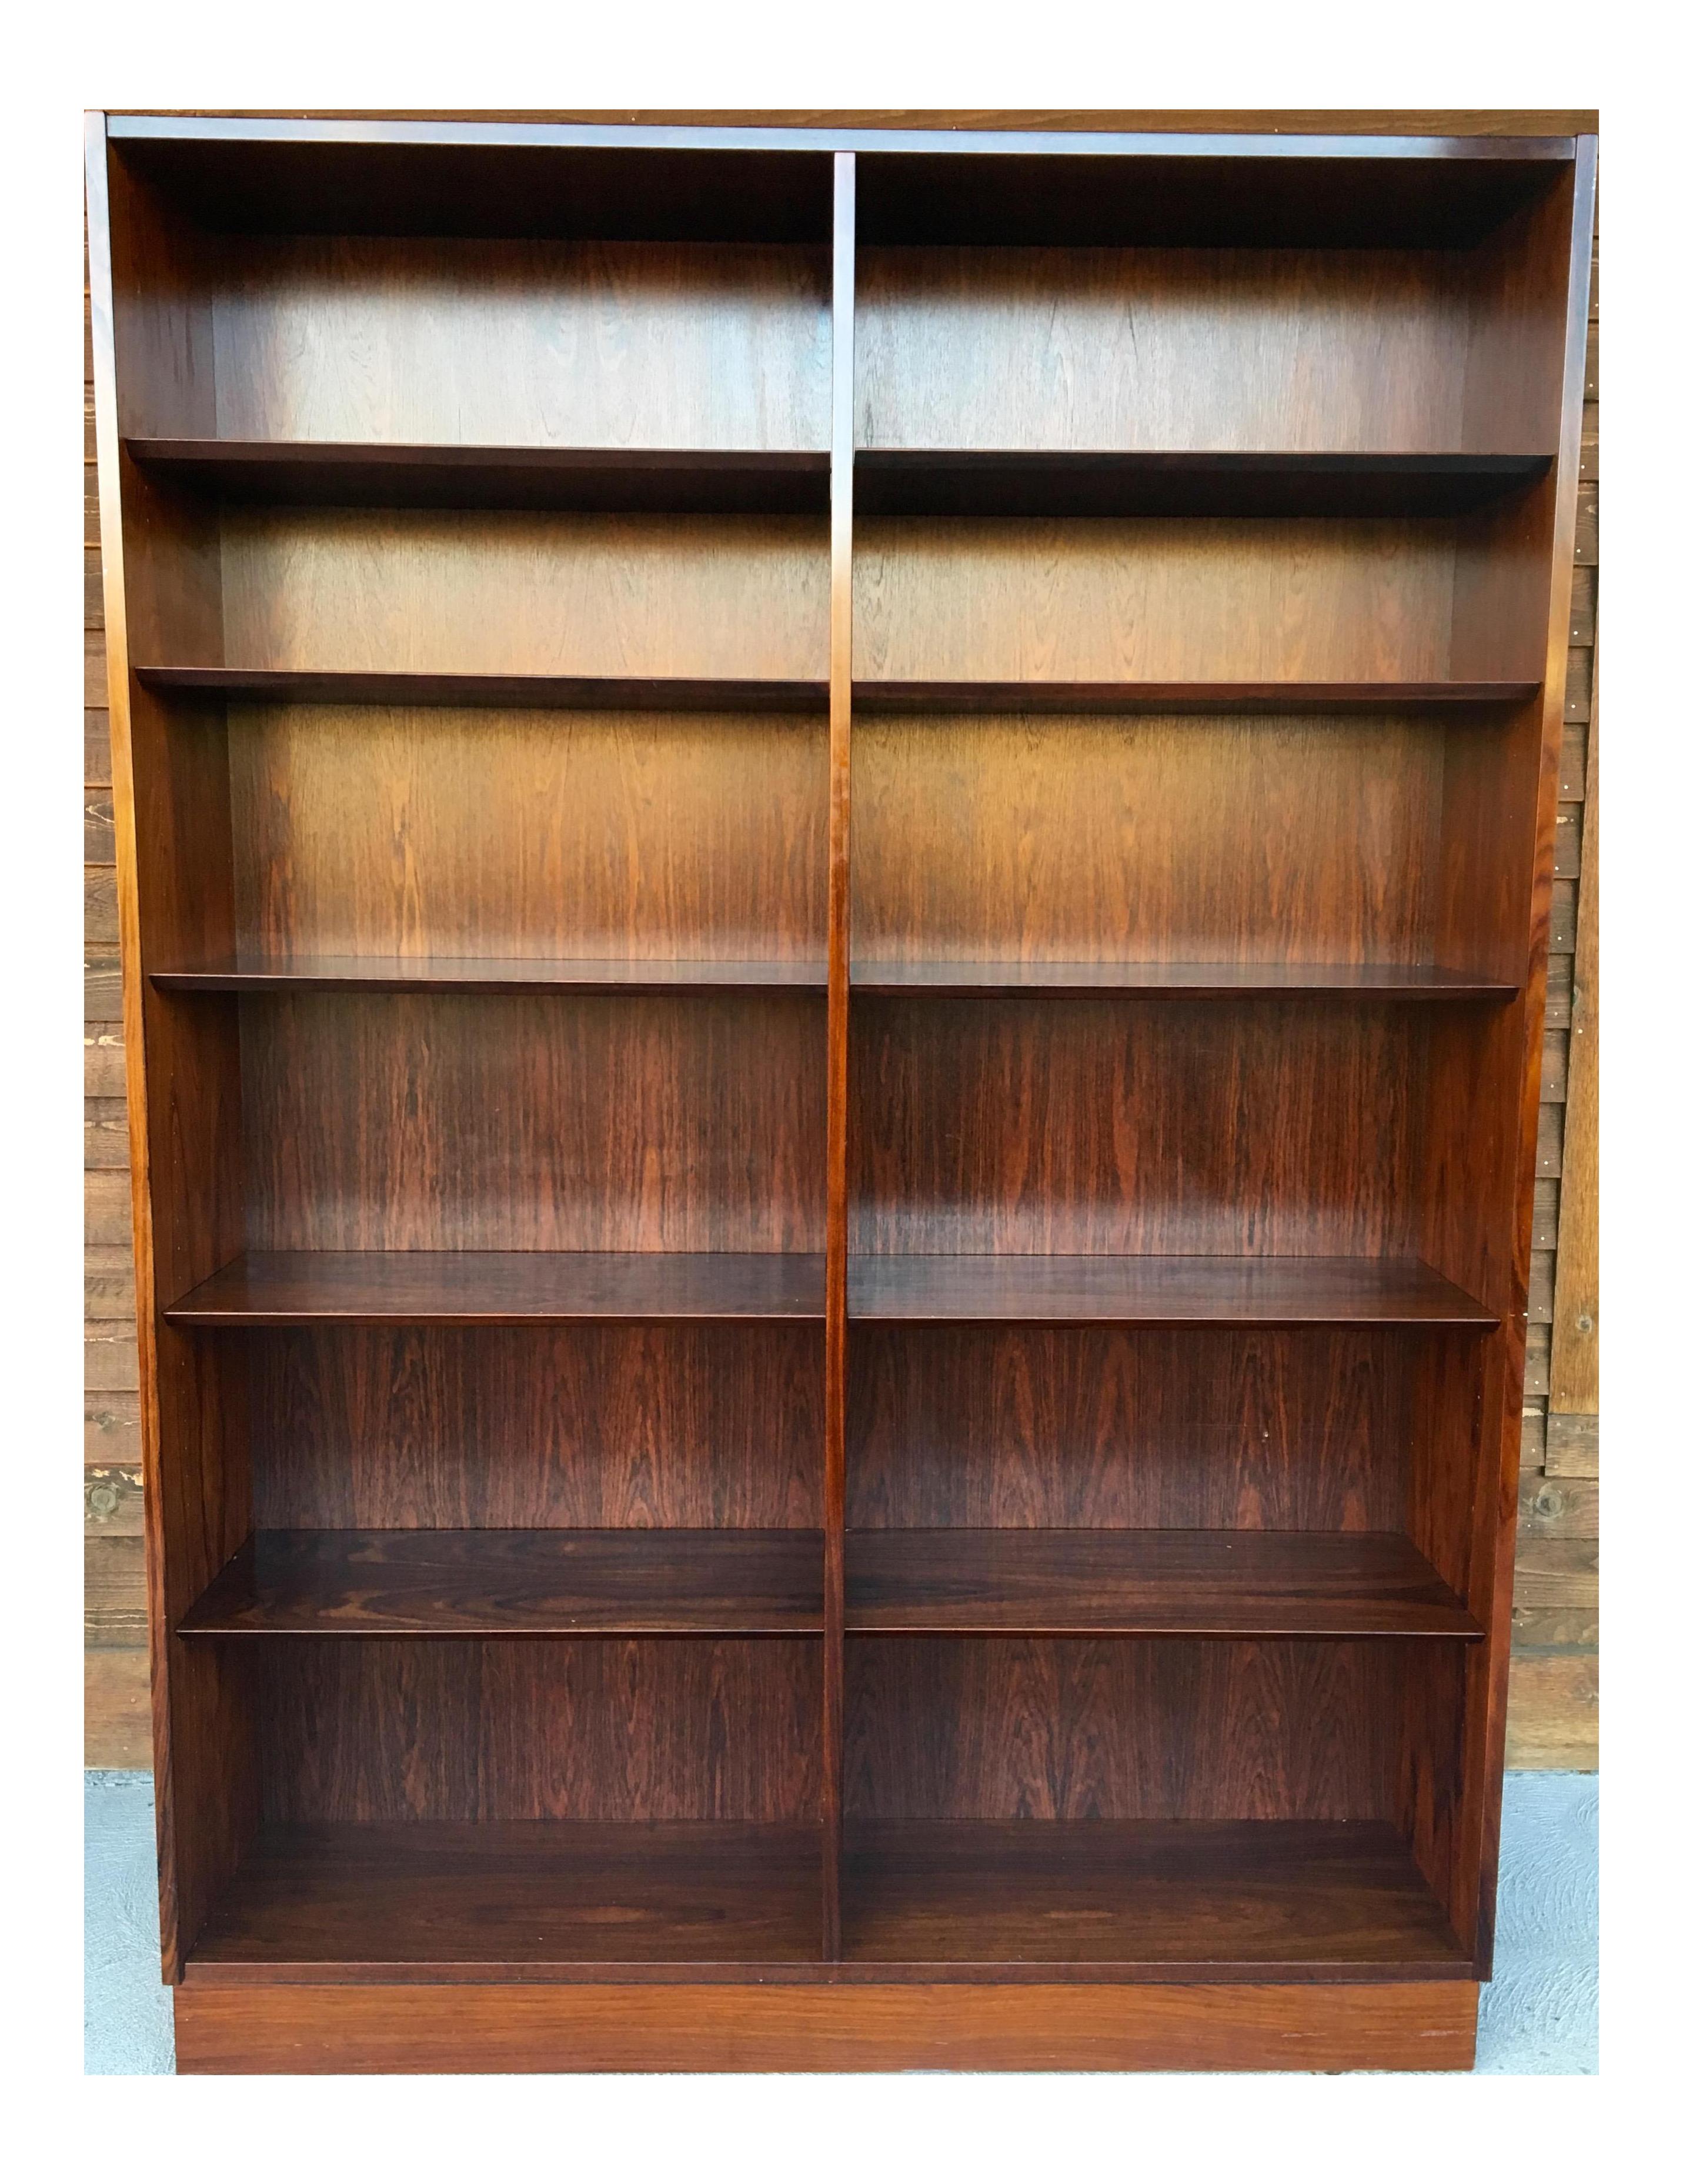 bookshelves diy style via industrial amazing bookshelf livingroom bookcases bookcase adorable tier and vintage usings australia ladder flanges furniture ok